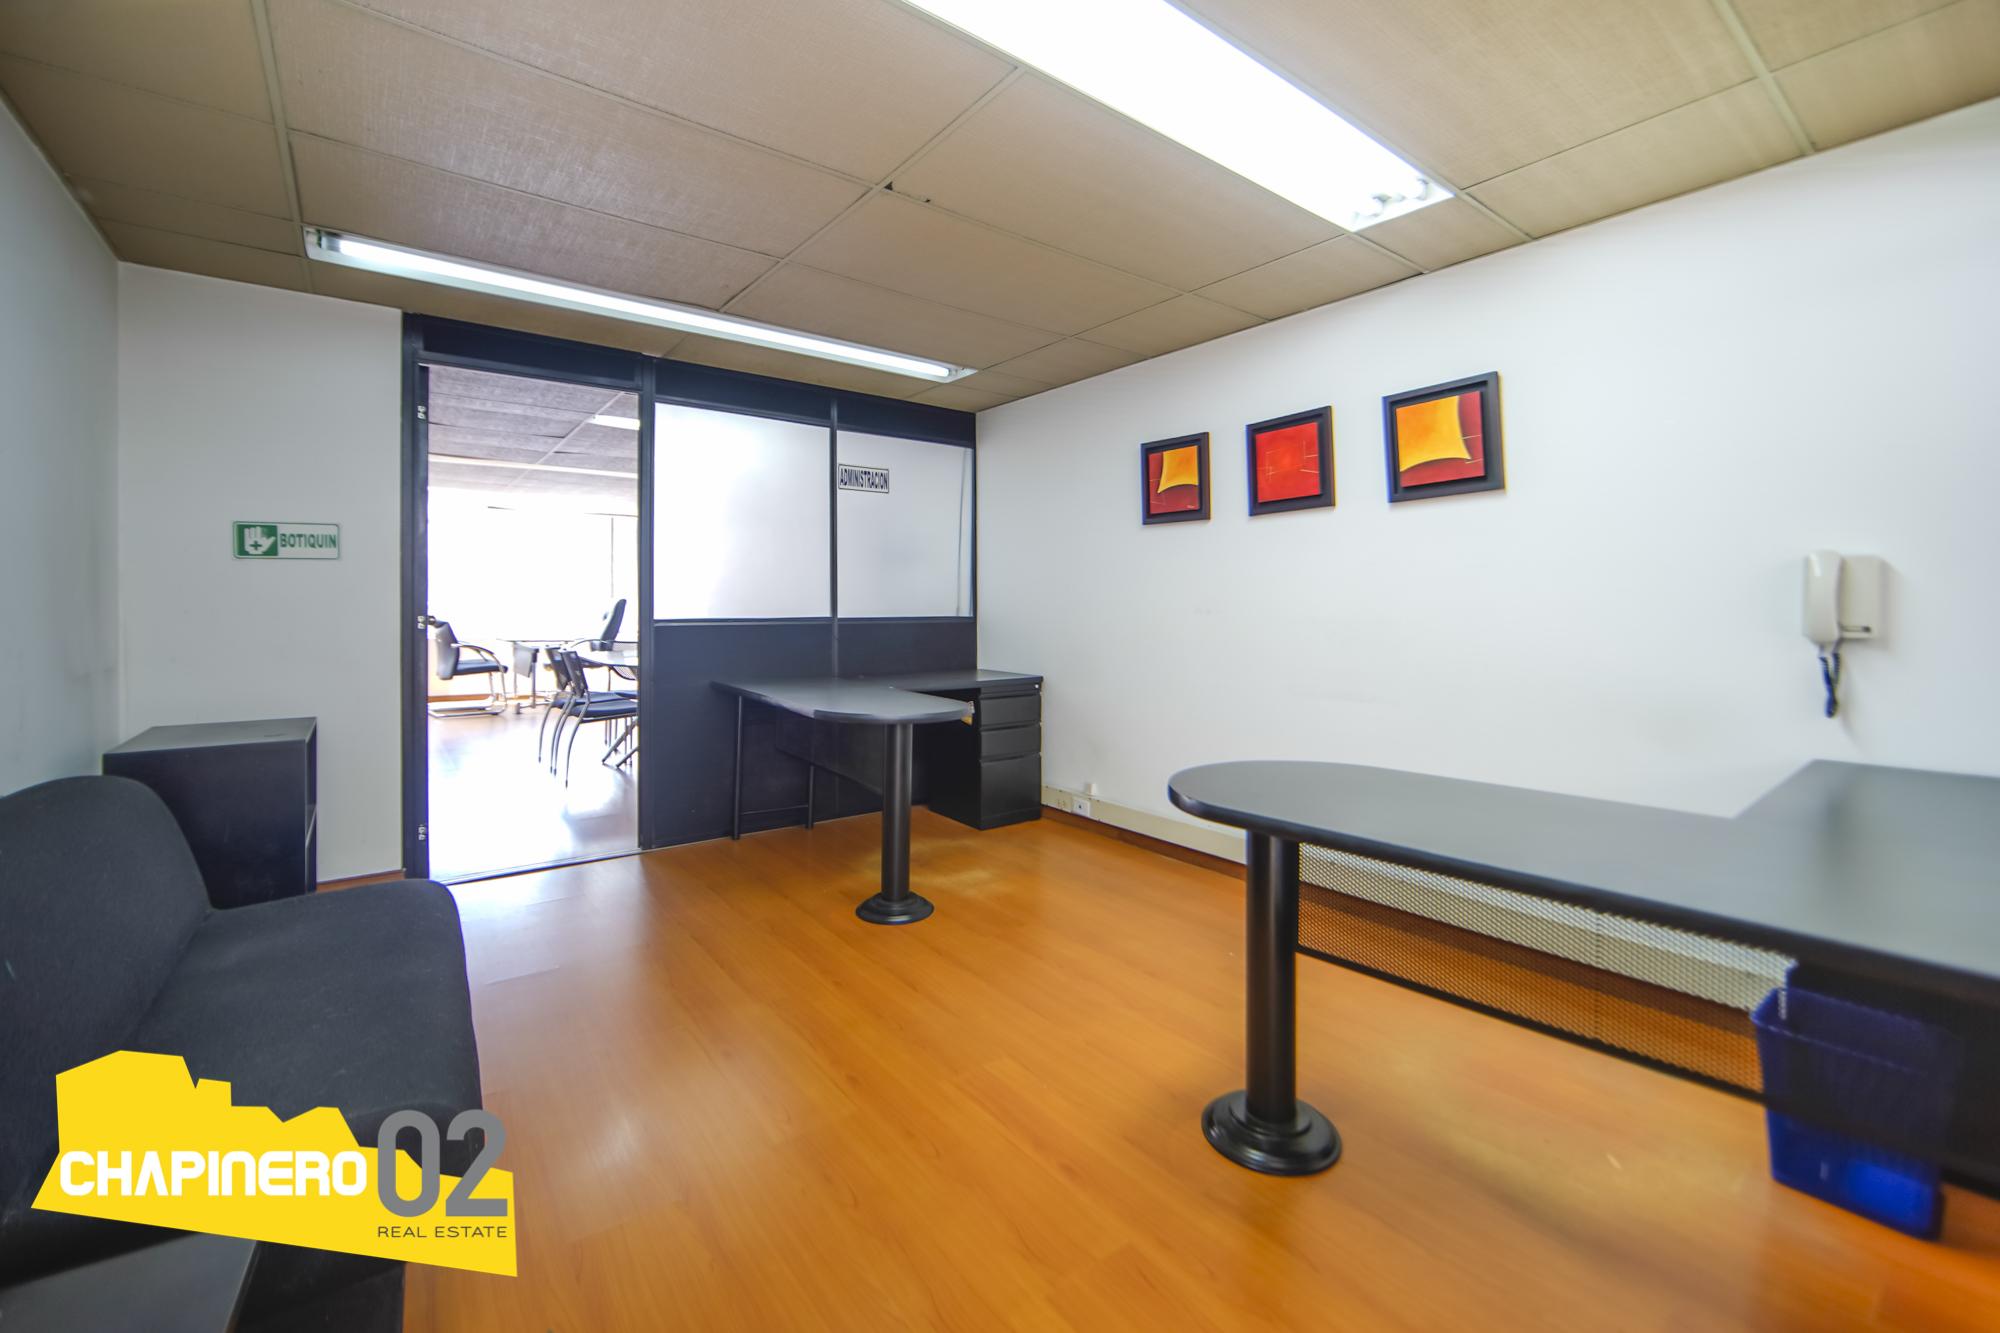 Oficina Amoblada :: 43 m² :: Chicó Norte 2:: $2,7M